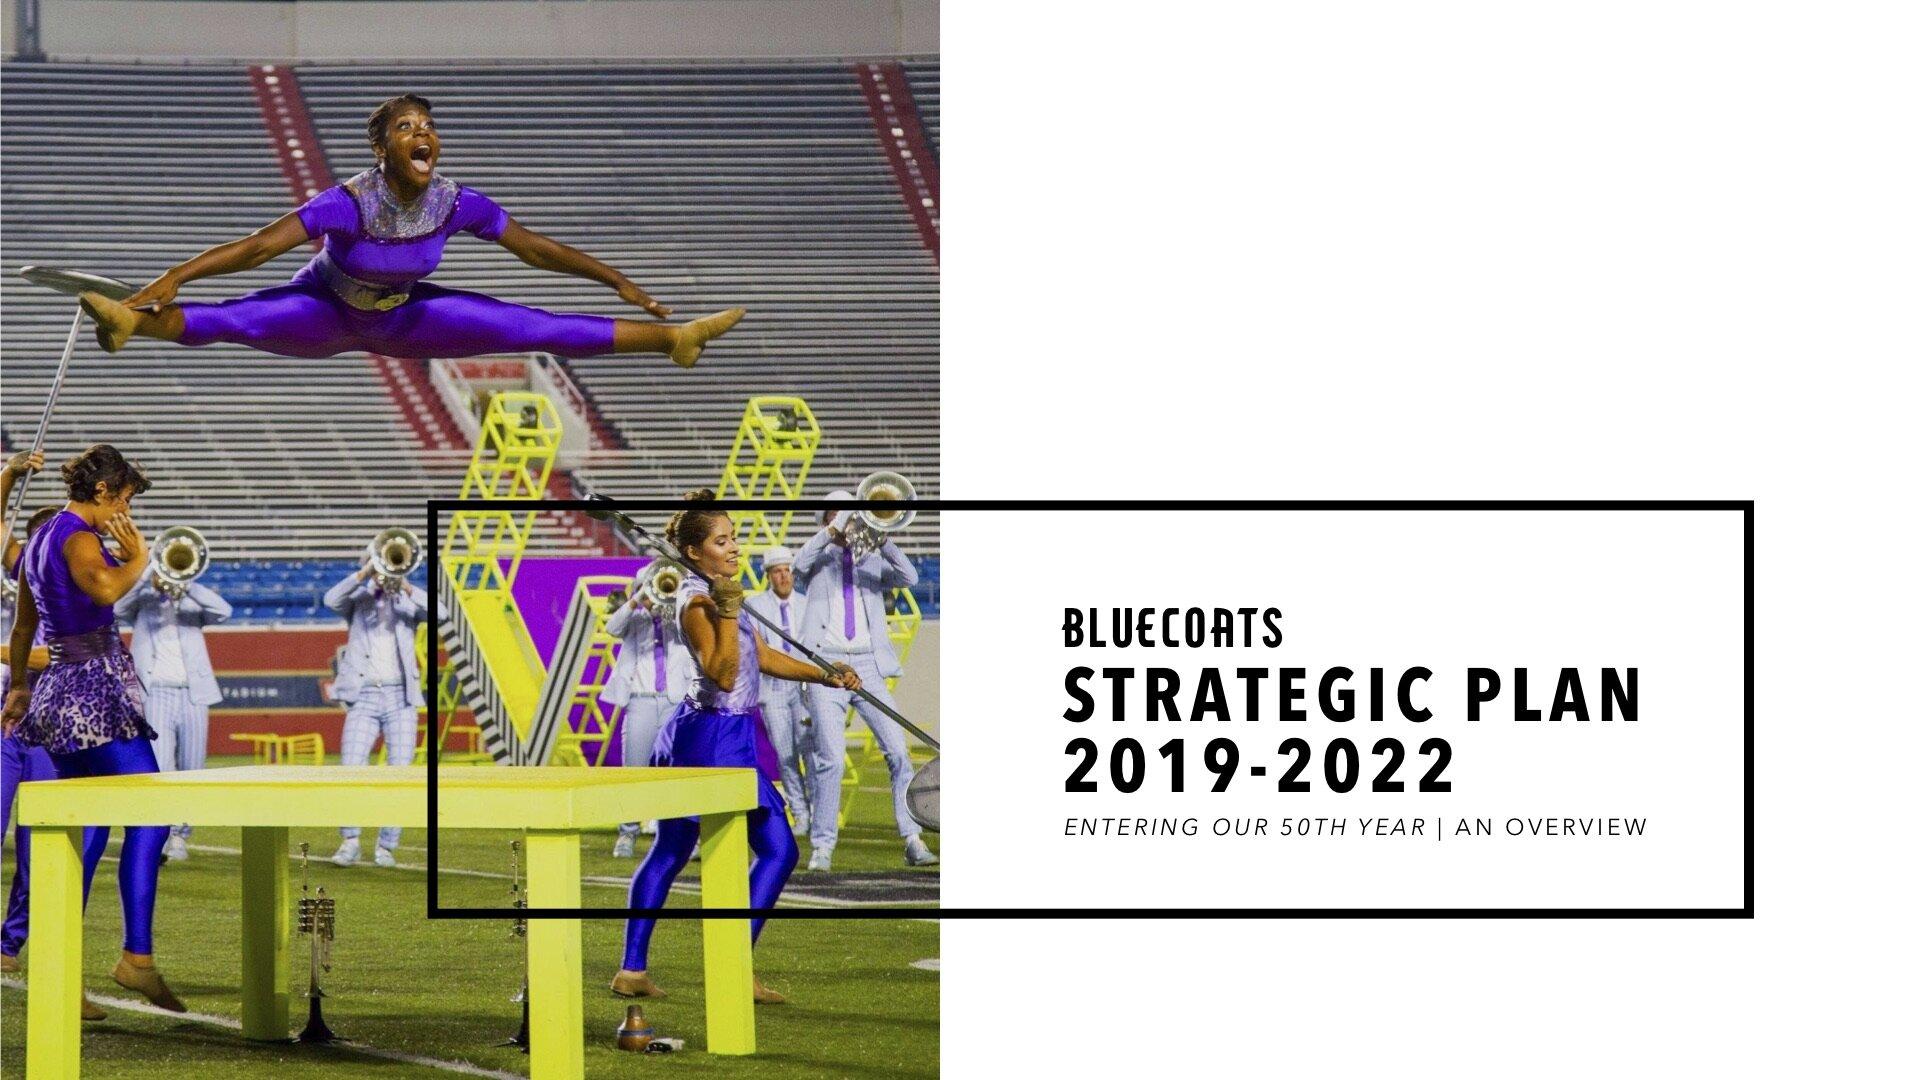 Strategic Plan Deck - 19-22 - Bluecoats, Inc..jpg